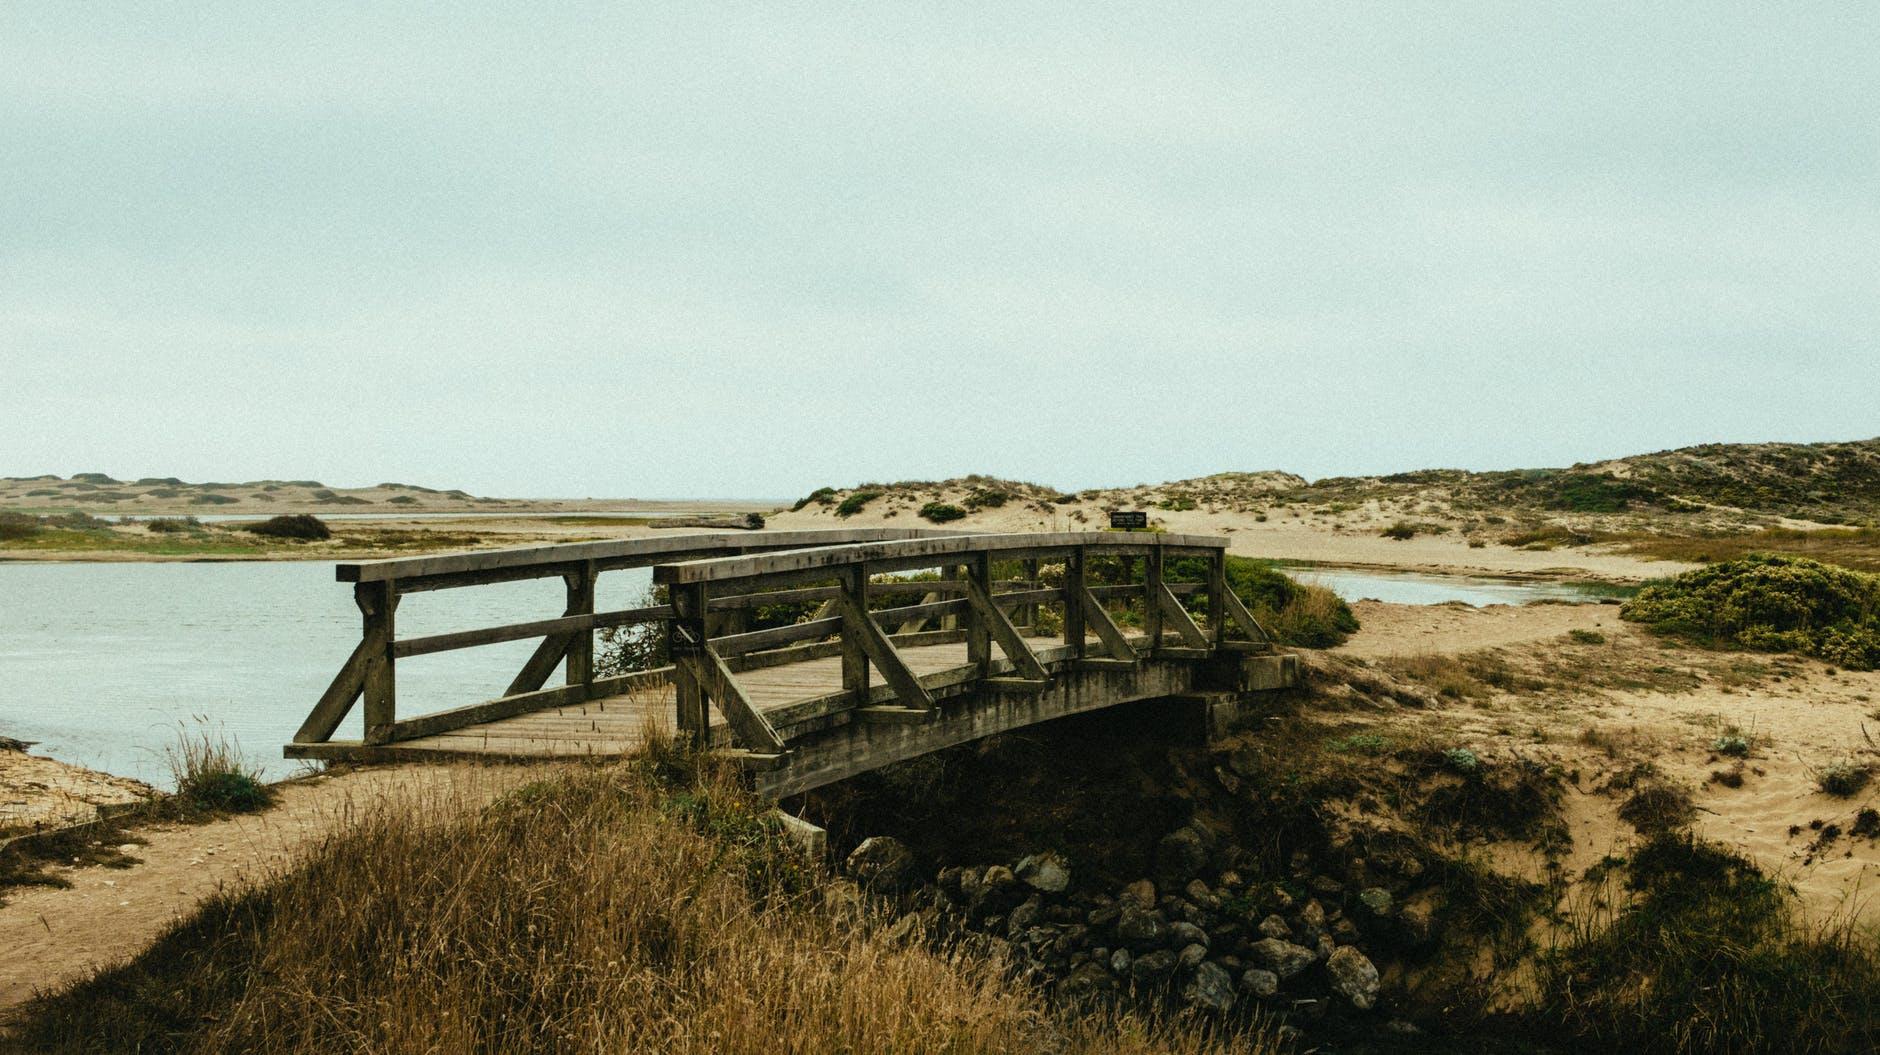 wooden bridge to similar landscape on either side